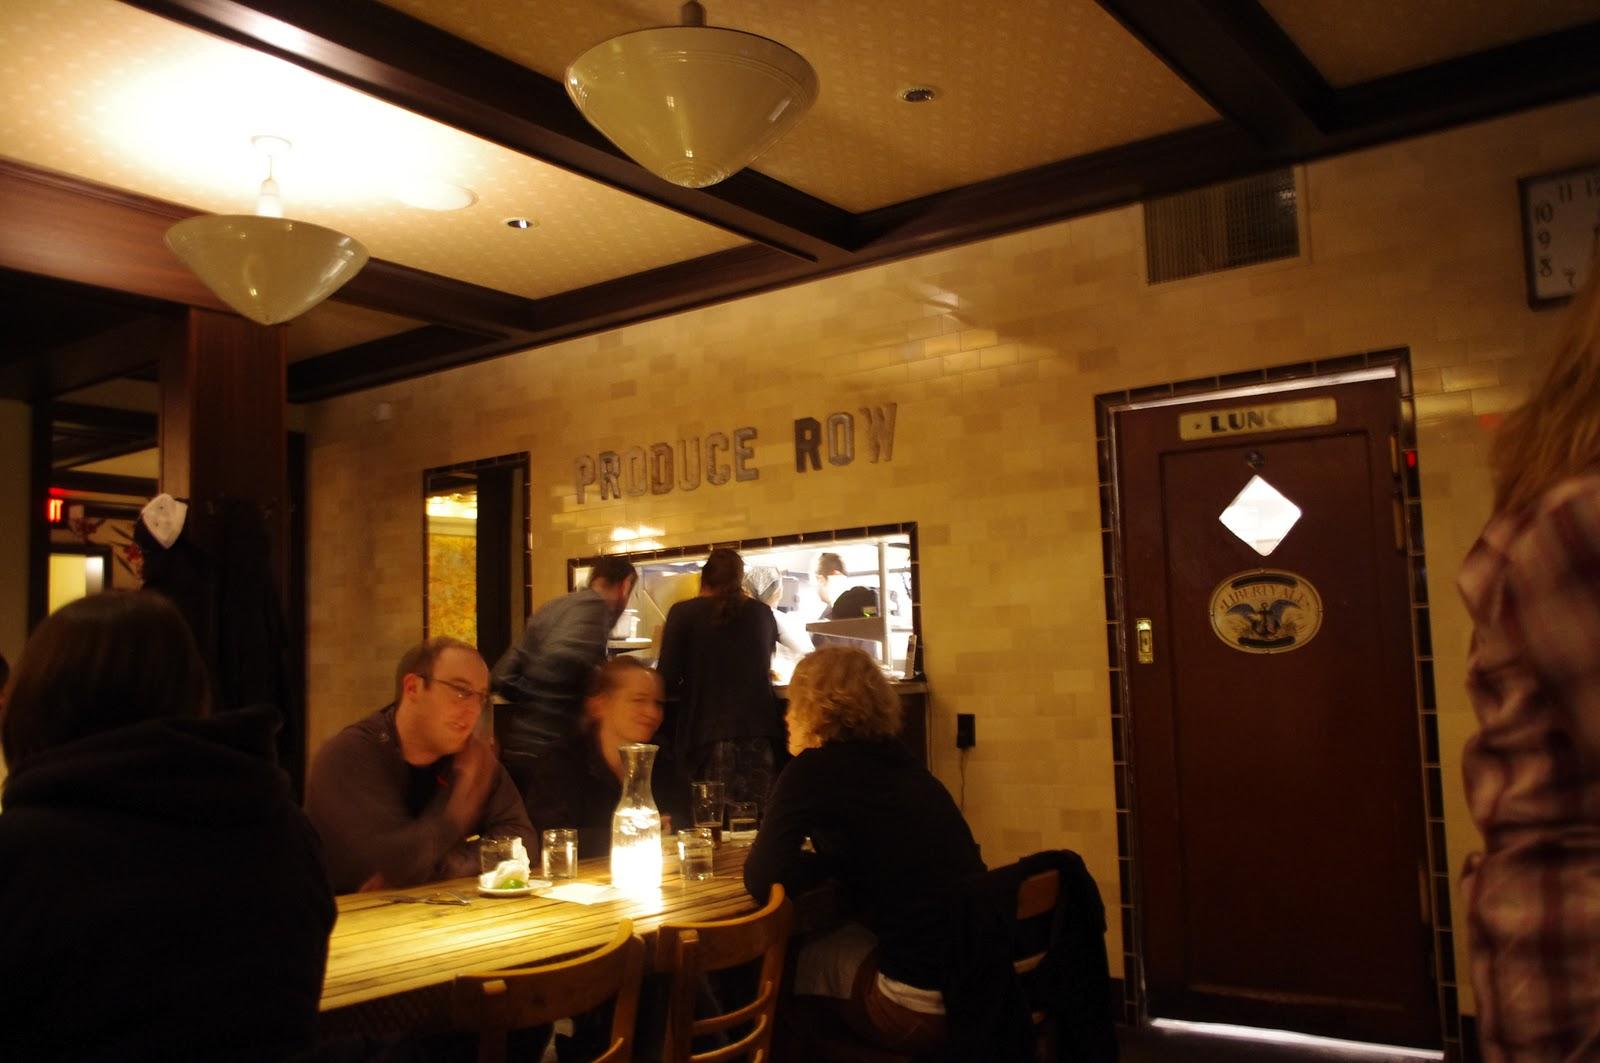 Produce Row Cafe Portland Happy Hour